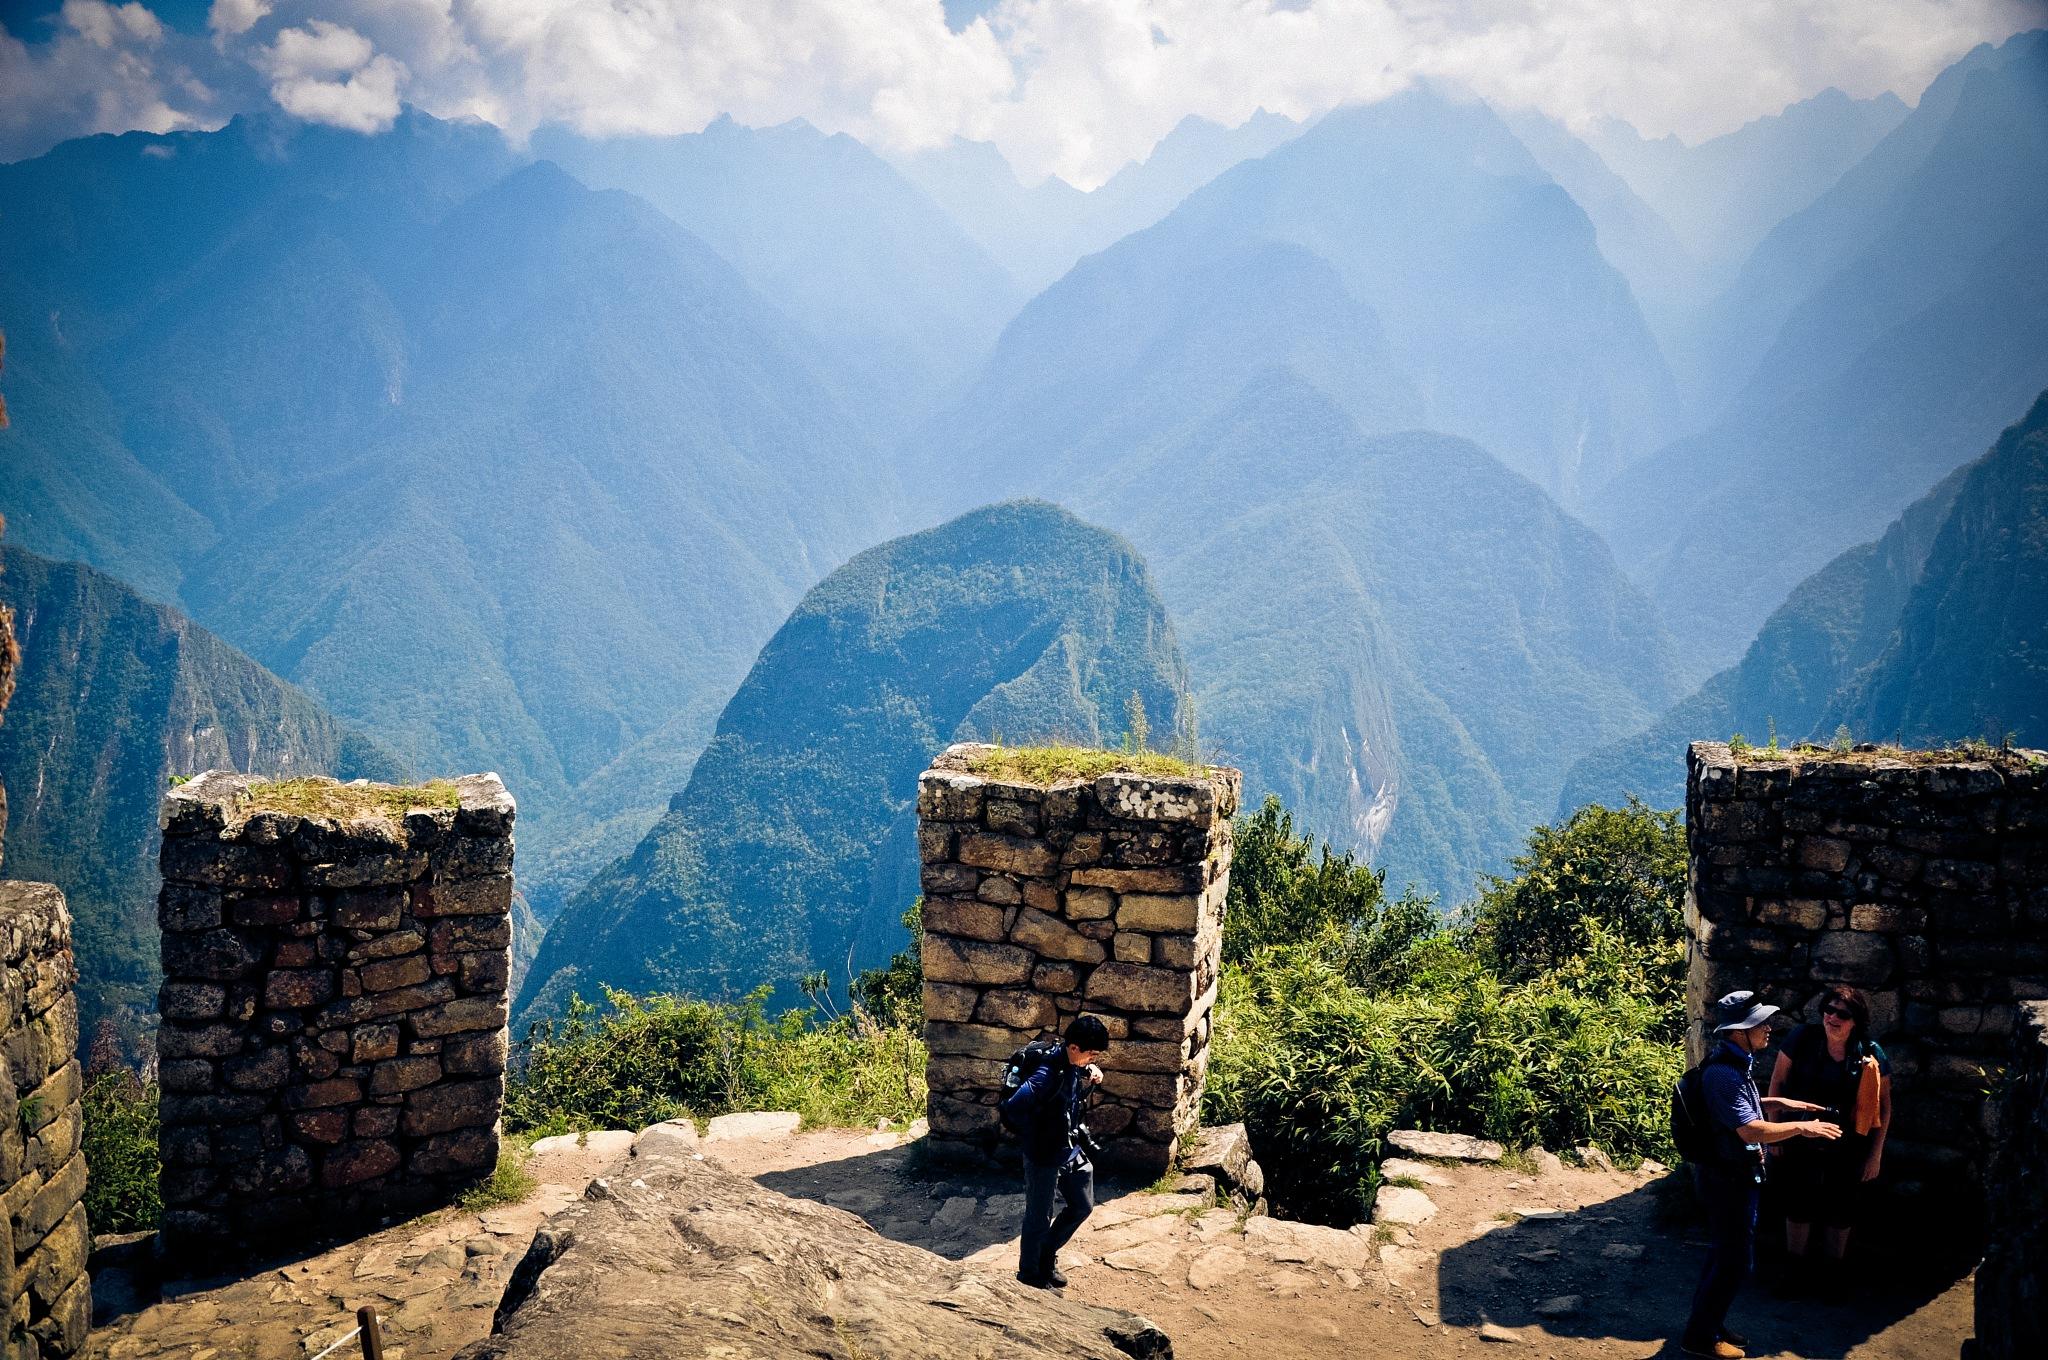 Climbing Machu Picchu Mountain (Peru) by Jiri Bielicky